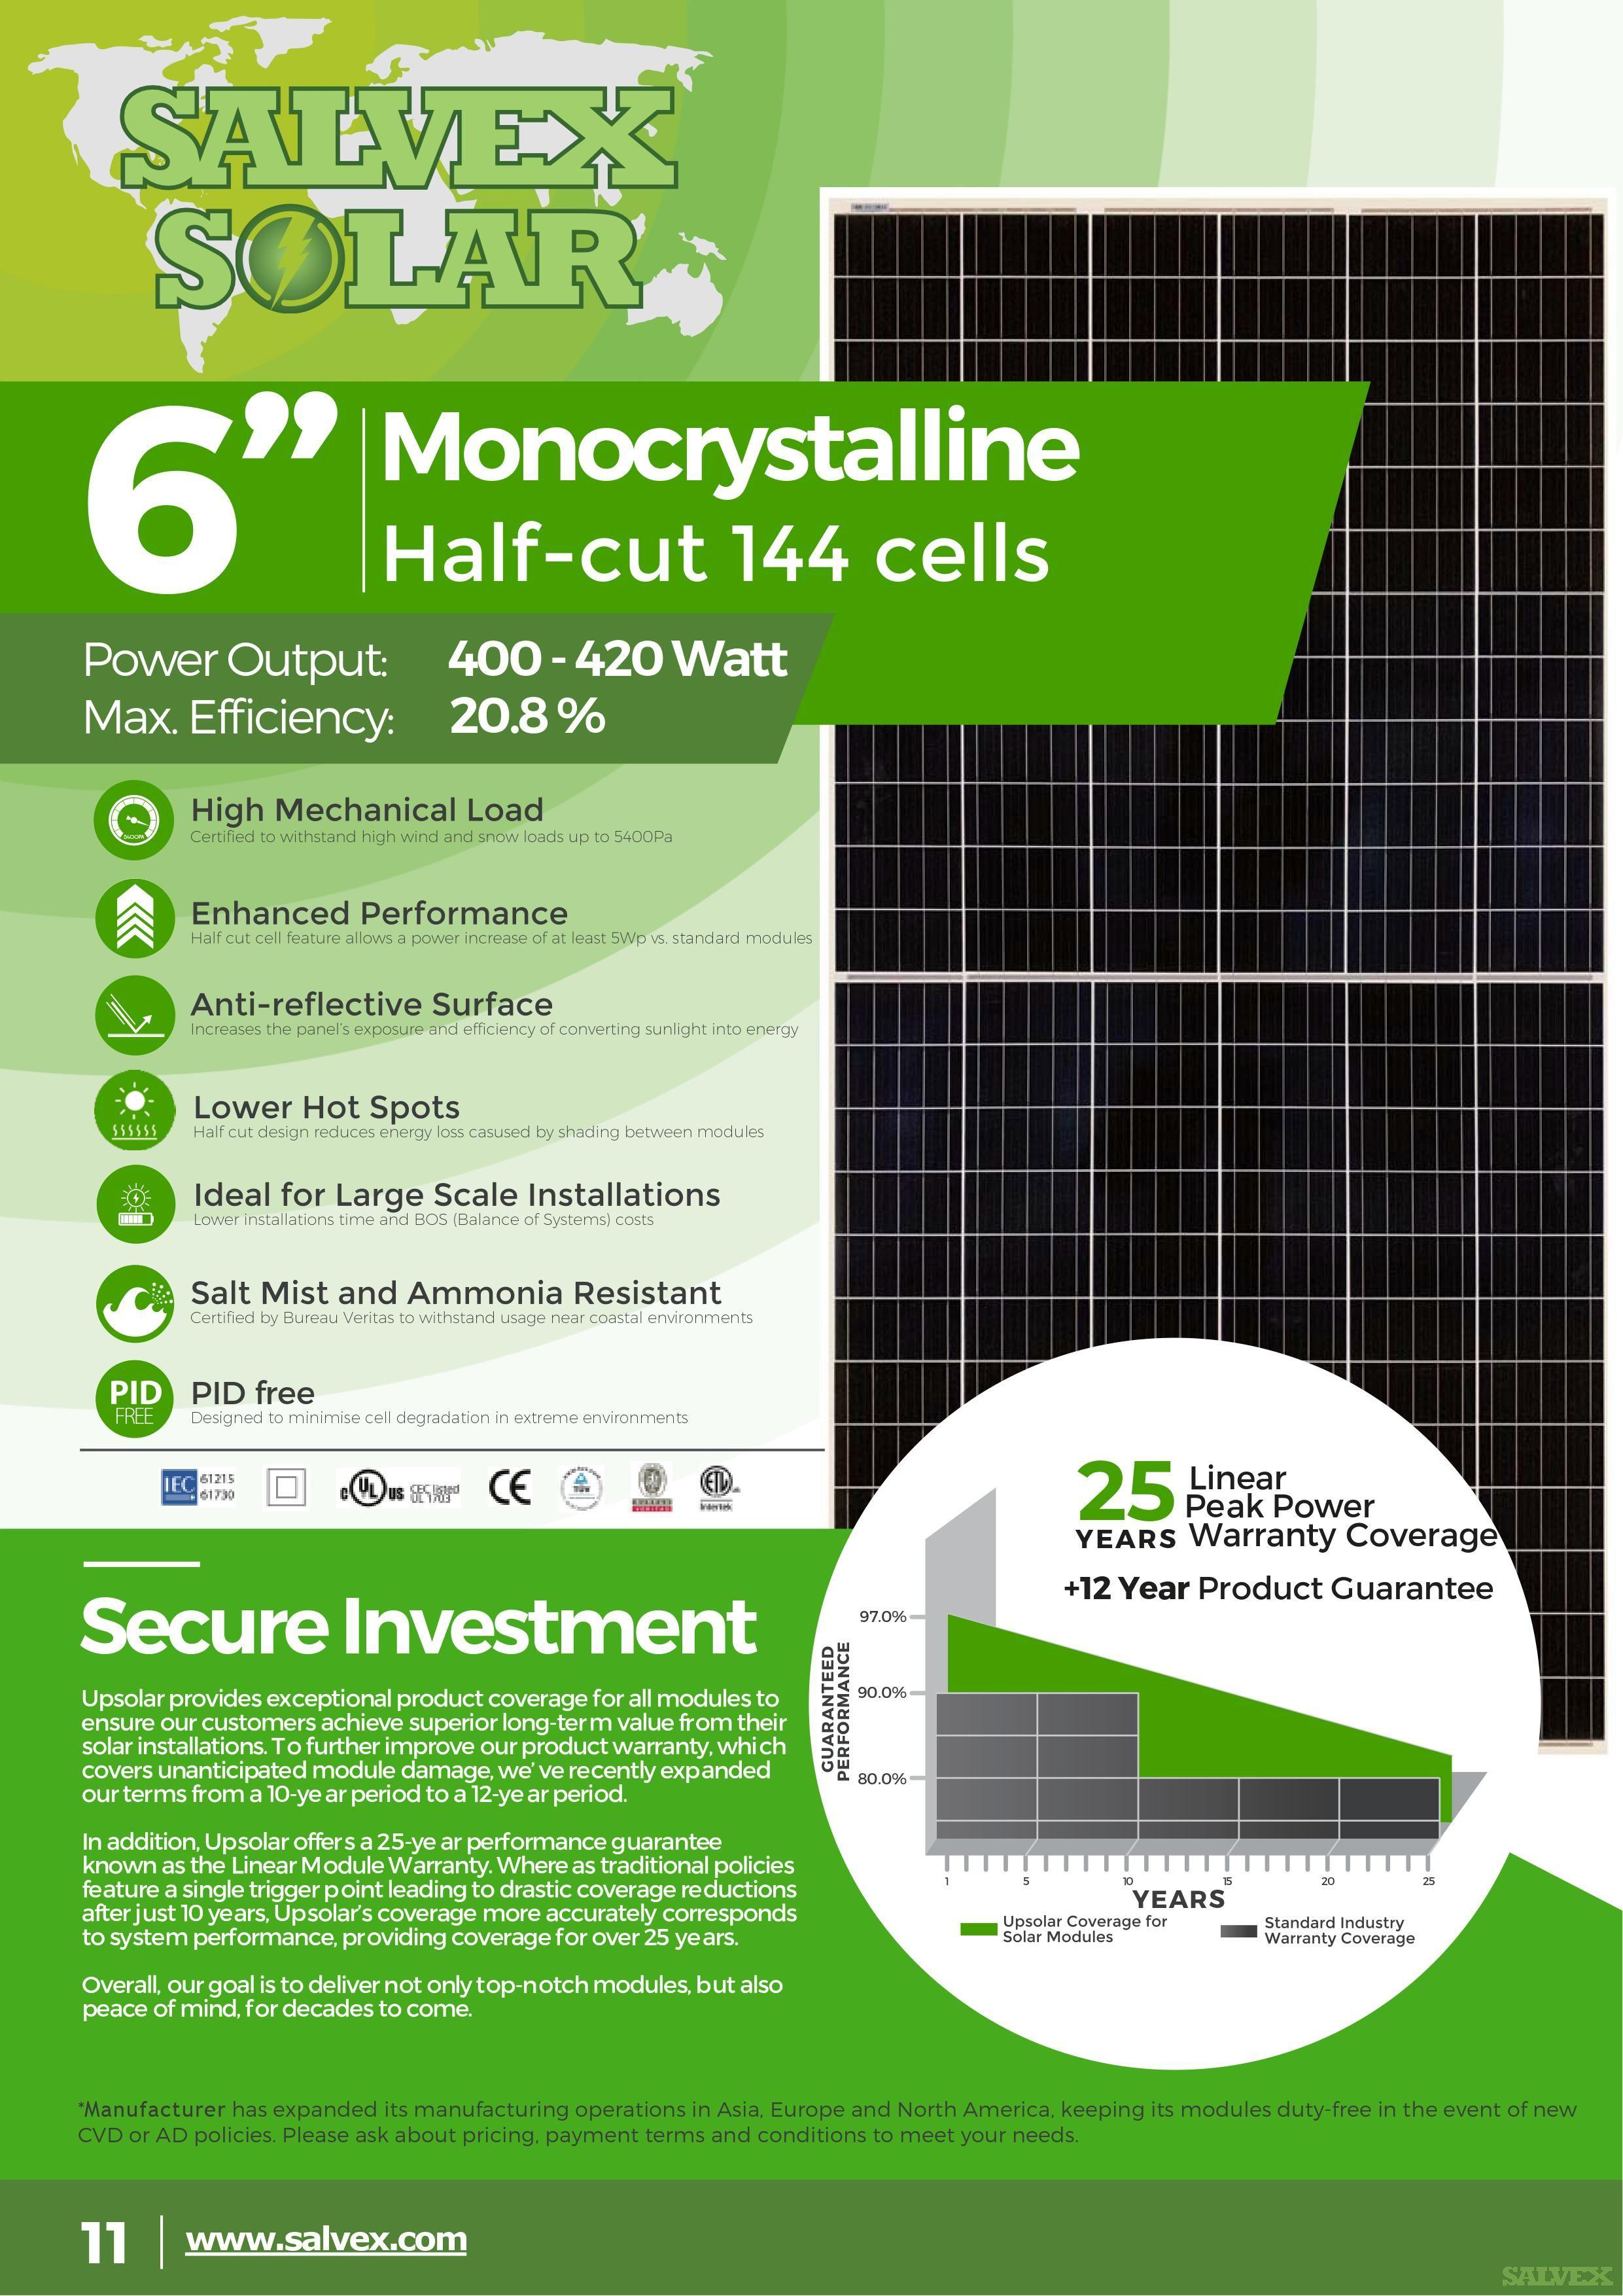 Salvex Solar 410W Monocrystalline PV Solar Panels (Minimum Order: 1 x 40HQ Container)